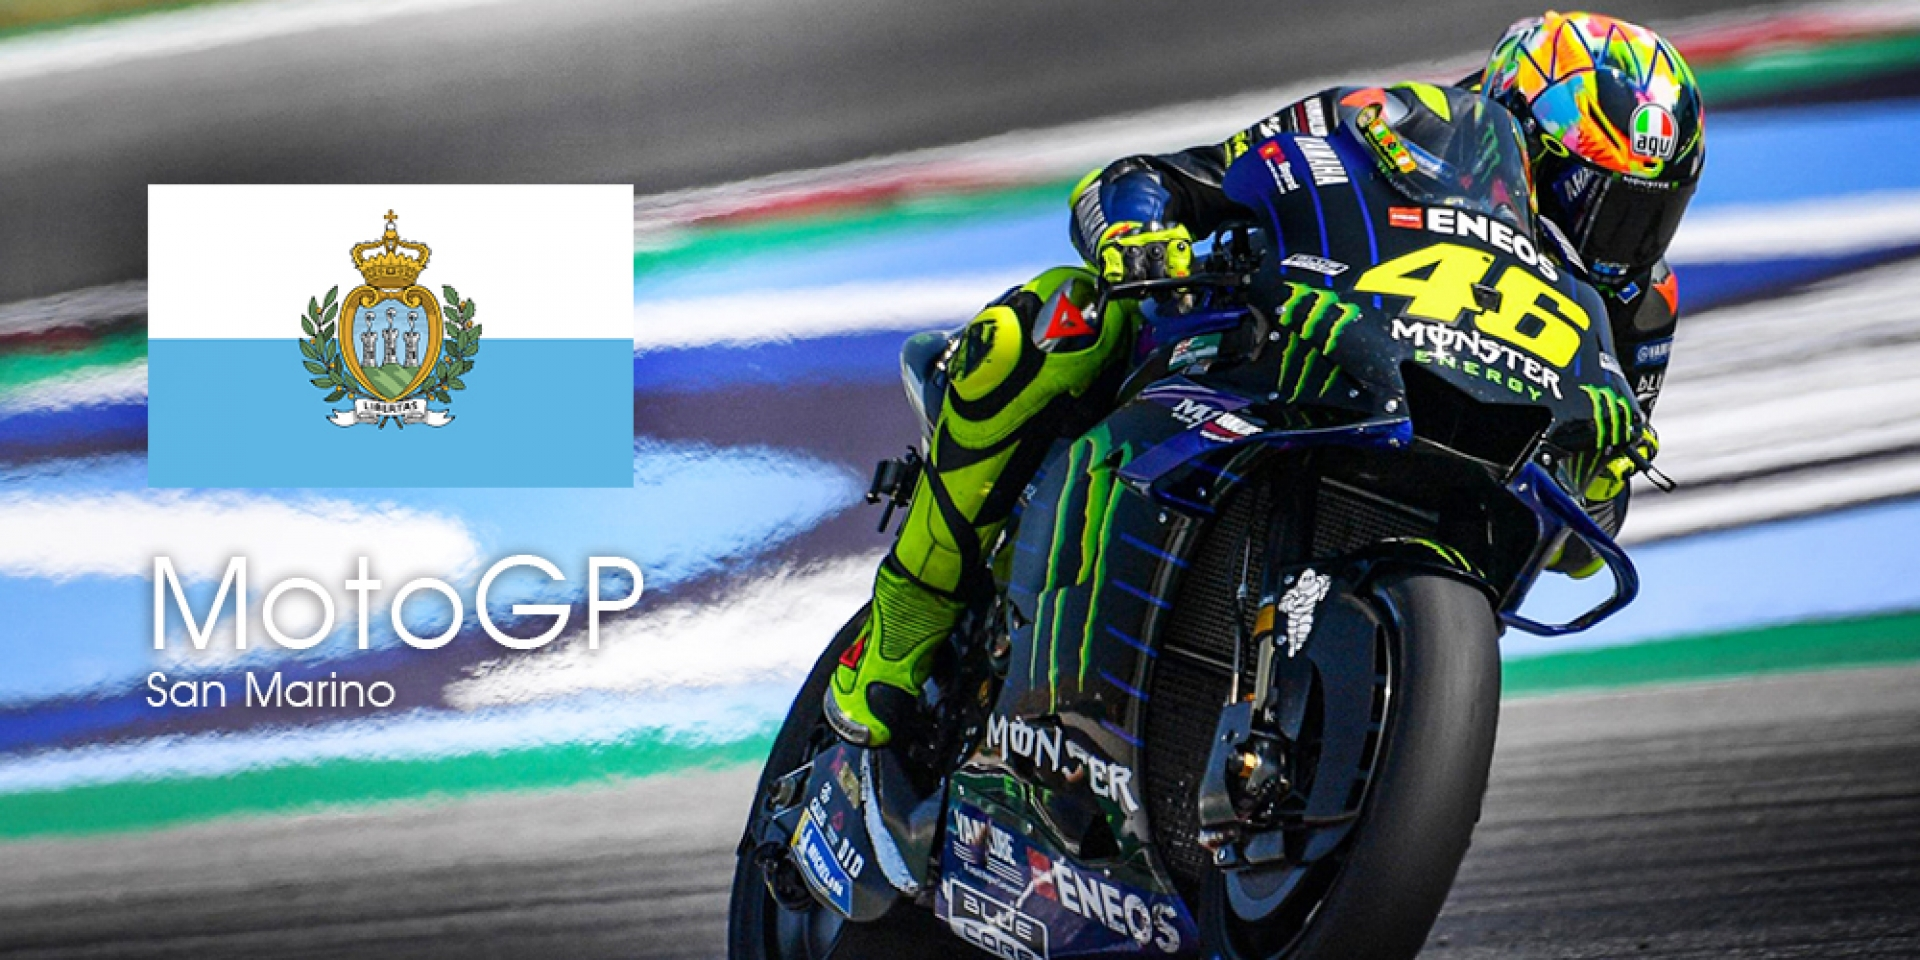 MotoGP 2019 義大利站 轉播時間